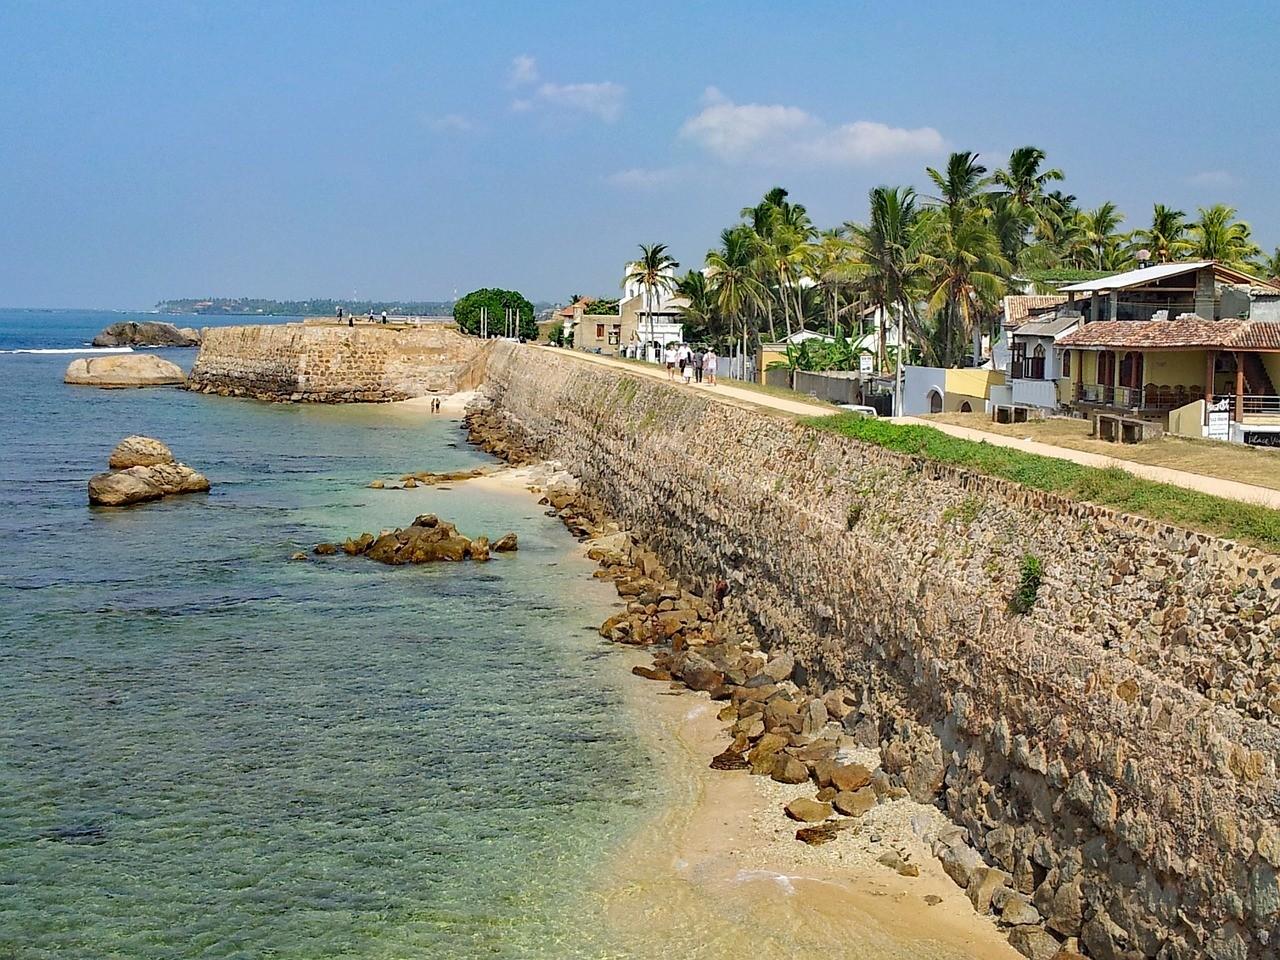 Galle Sri Lanka 5 Star Hotels